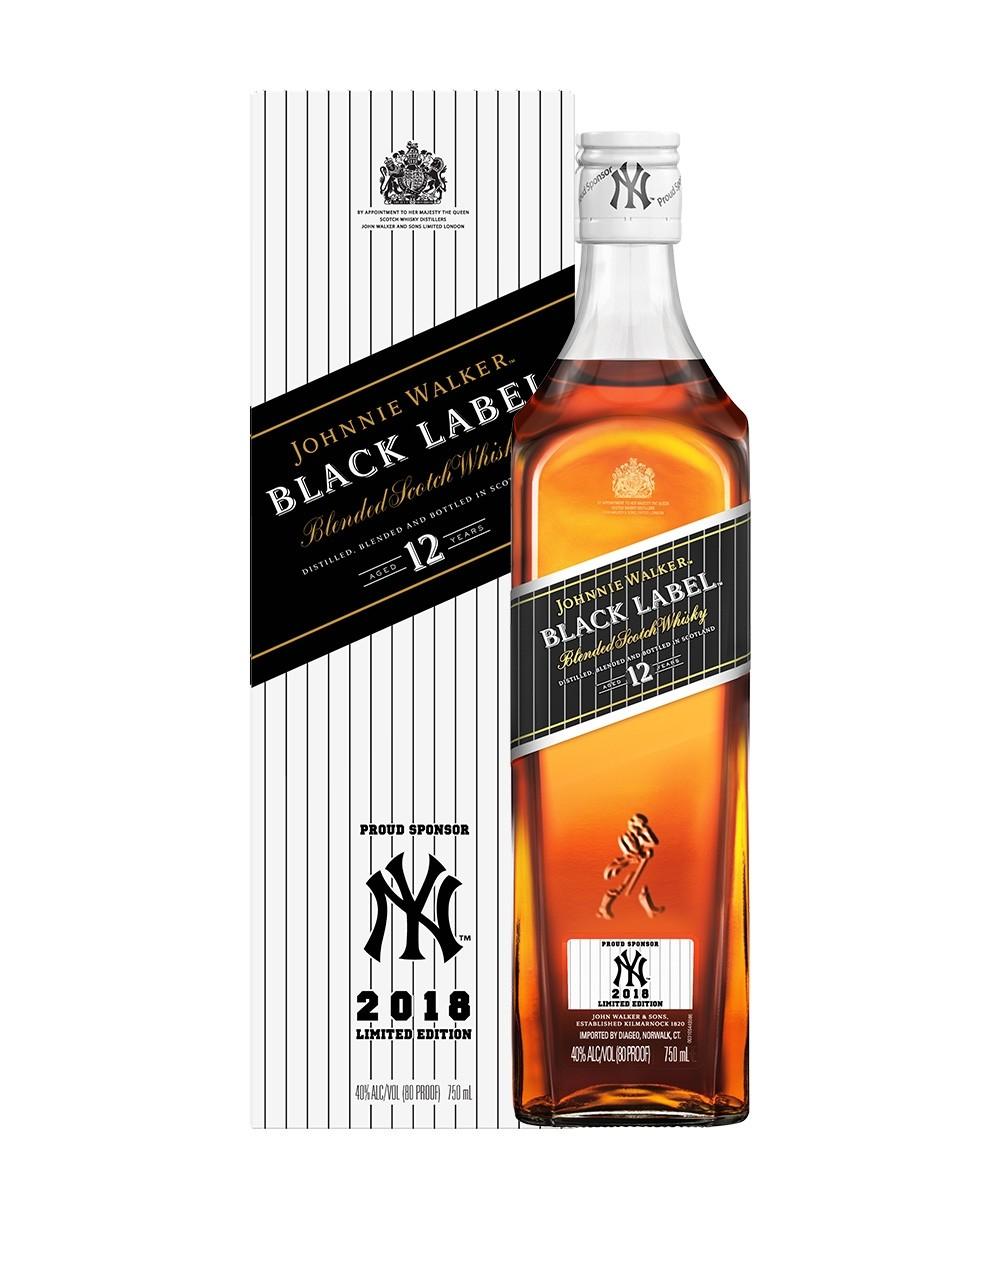 Johnnie Walker Black Label Yankees 2018 Limited Edition